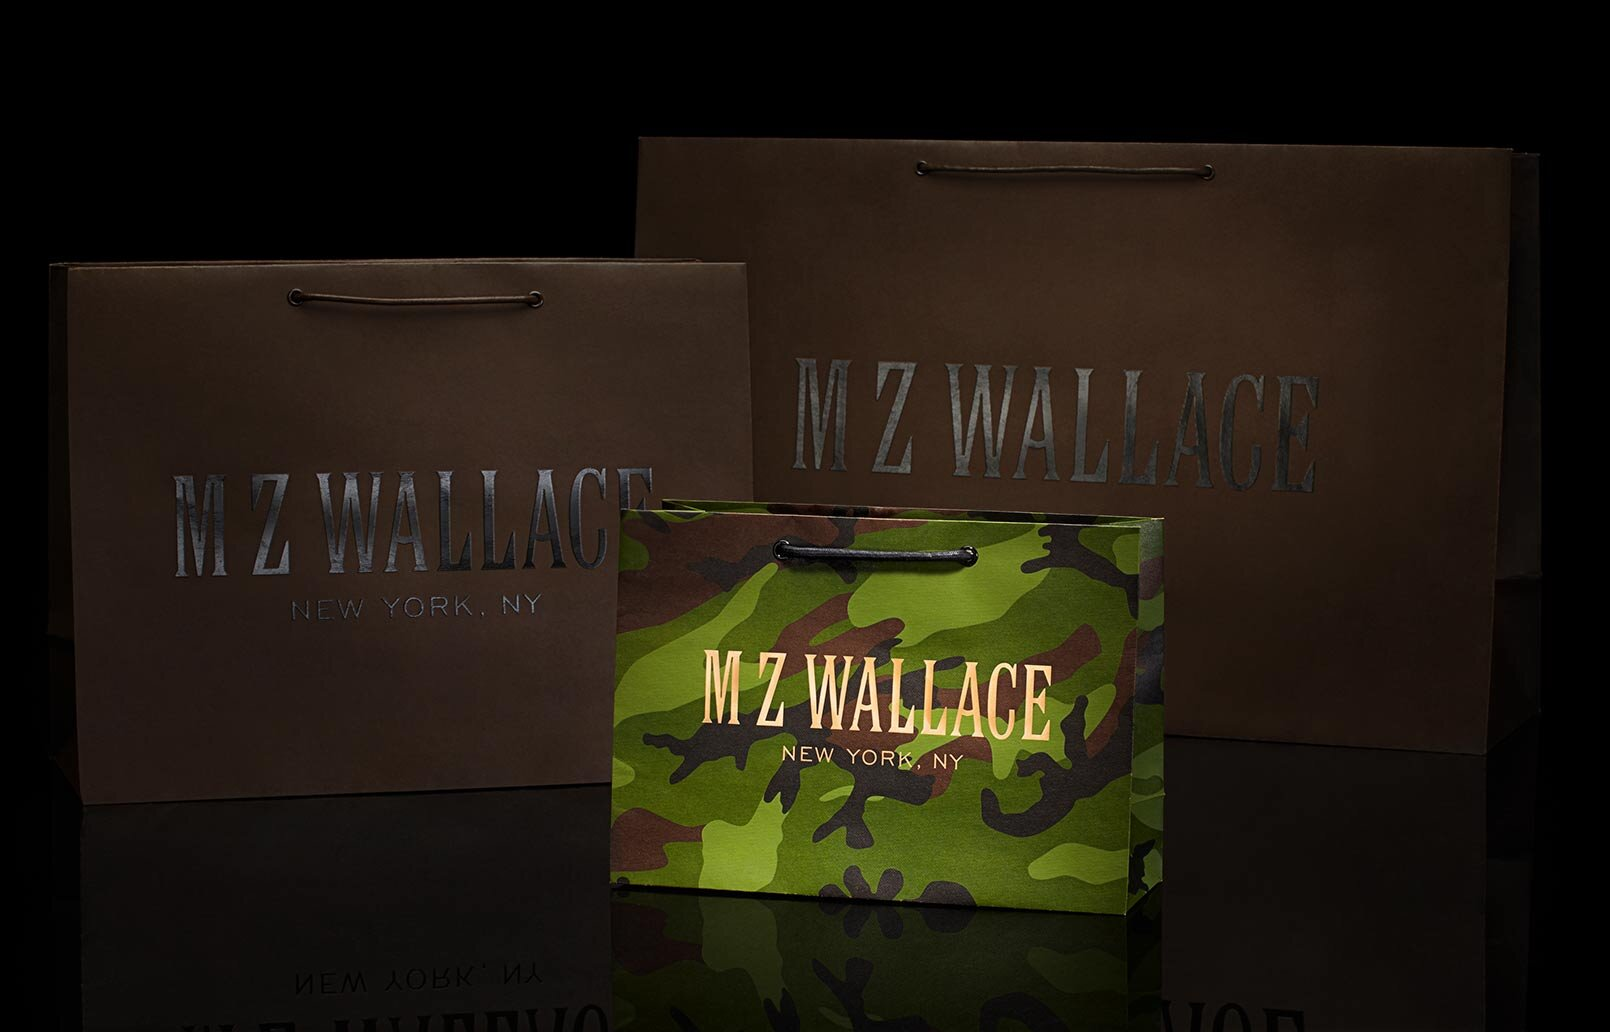 MZ-Wallace-Shopping-Bag-Design-Packaging-Company-3.JPG